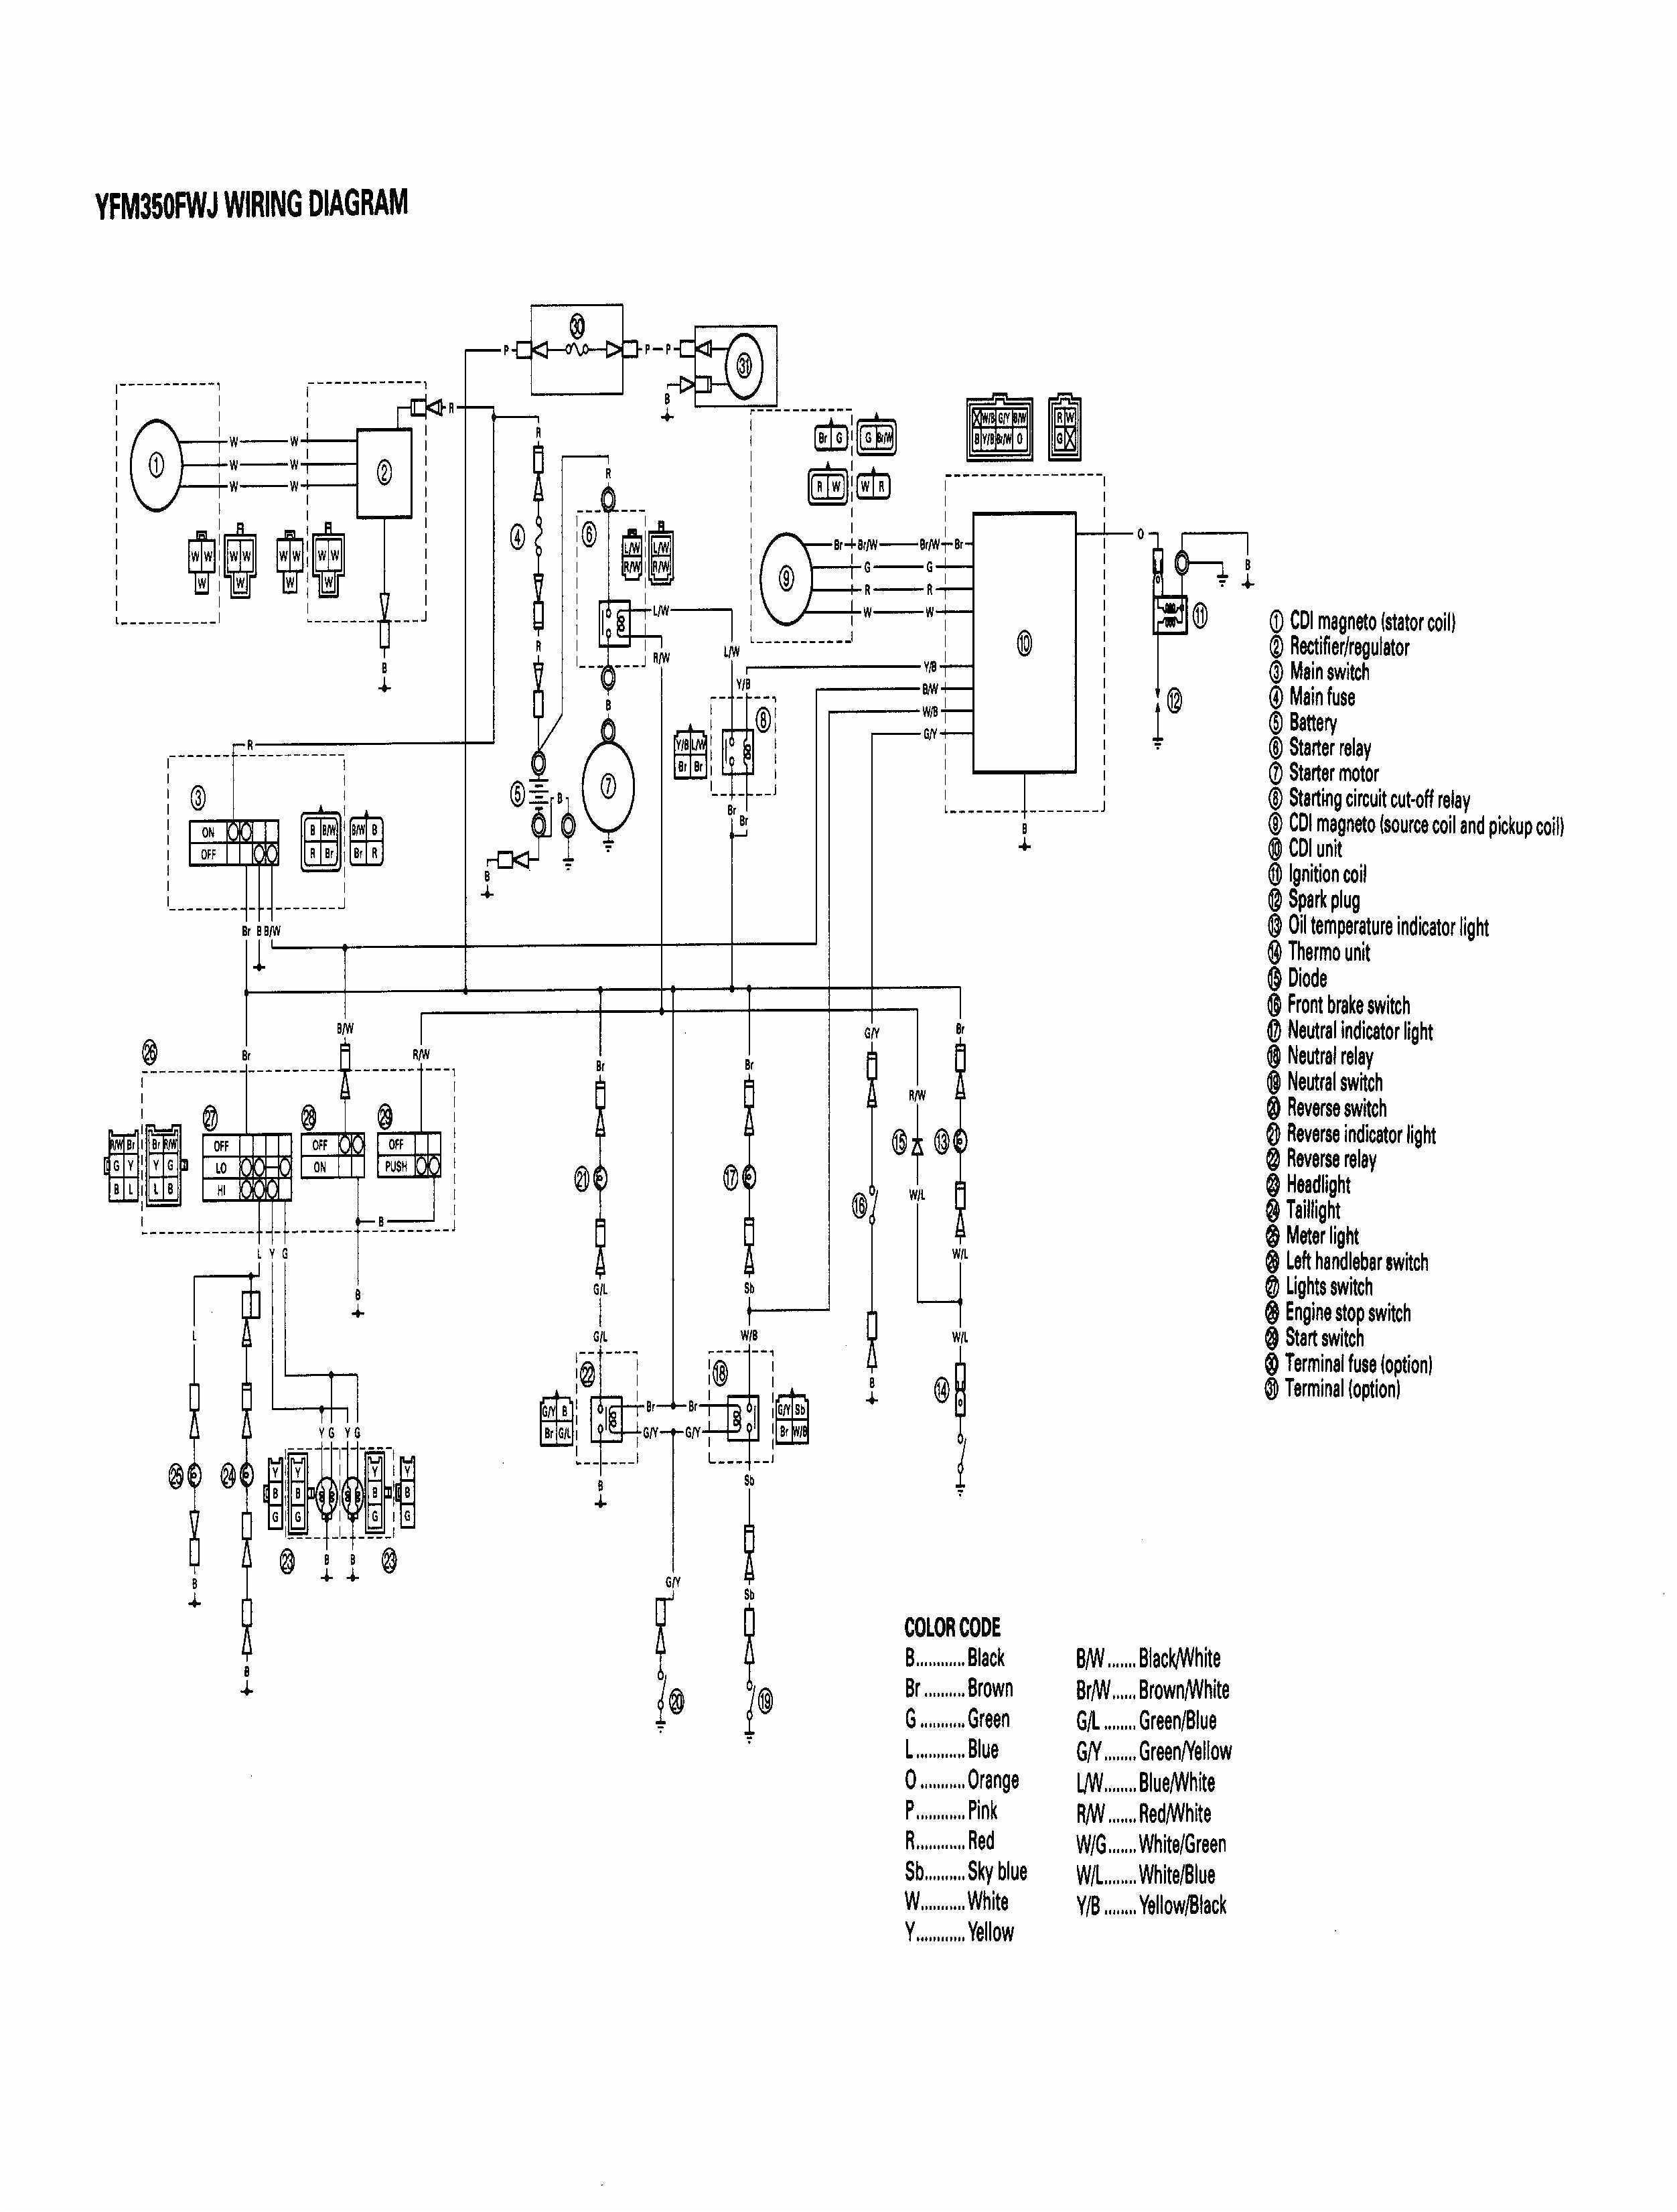 wiring diagram superwinch s4000 diagram database reg superwinch xt wiring diagram wiring diagram superwinch 4200 wiring